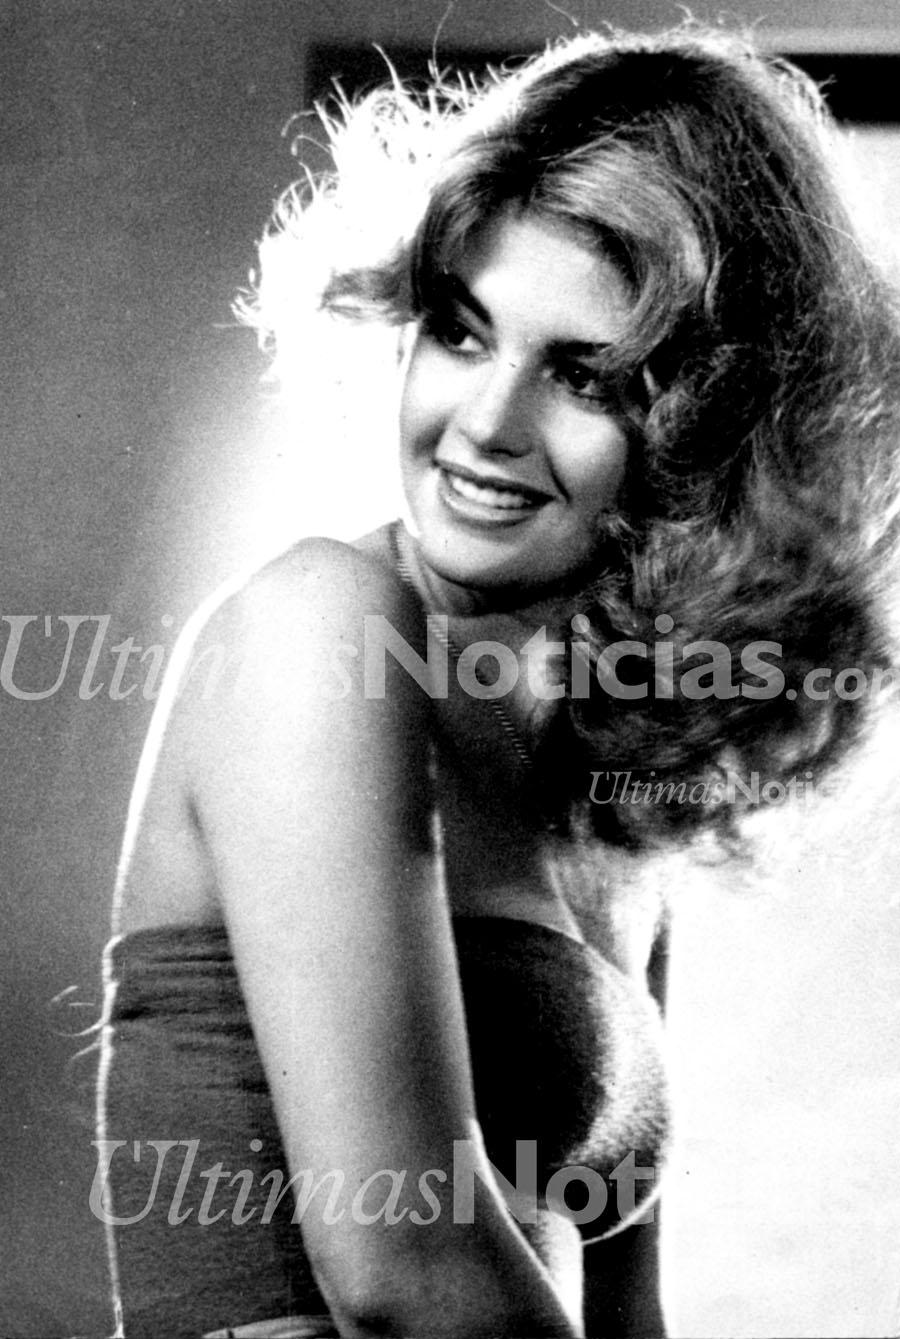 irene saez, miss universe 1981. - Página 3 E141c610